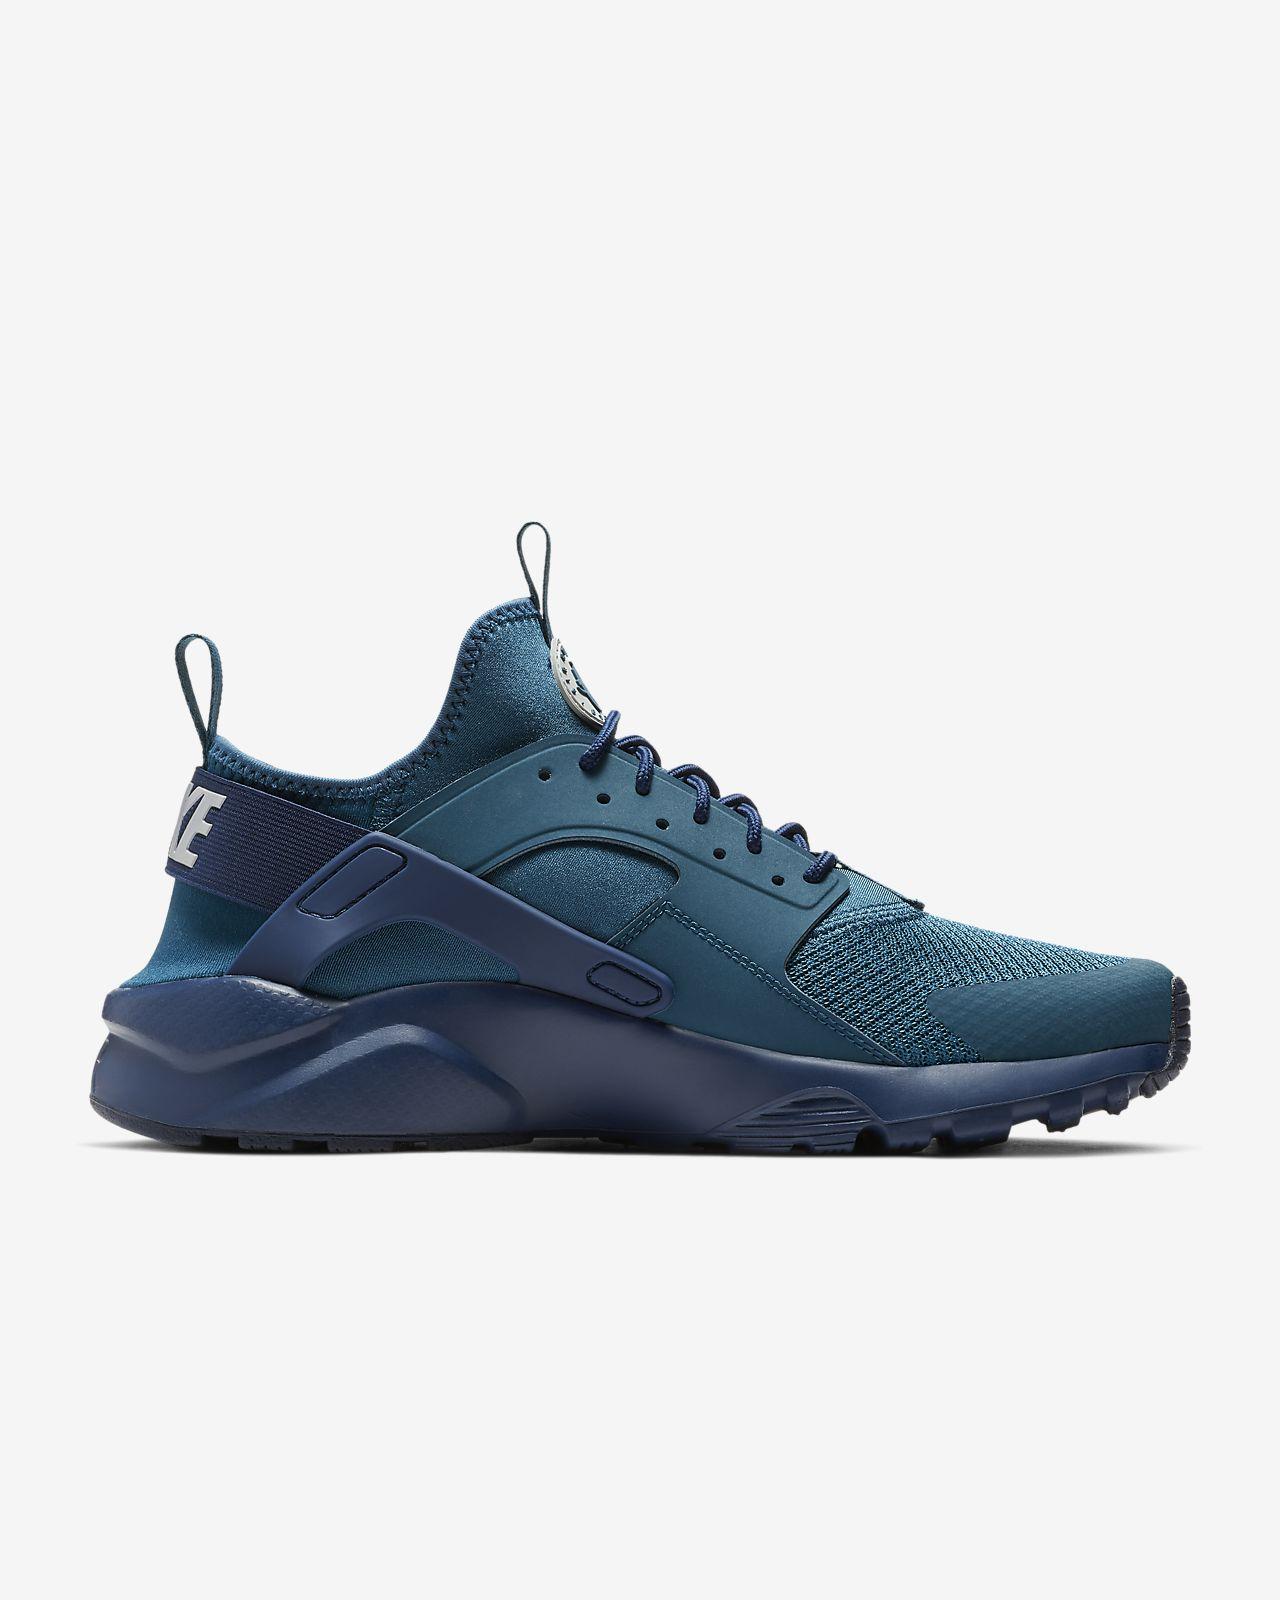 hot sale online 53c15 87fdb ... Nike Air Huarache Ultra Men s Shoe